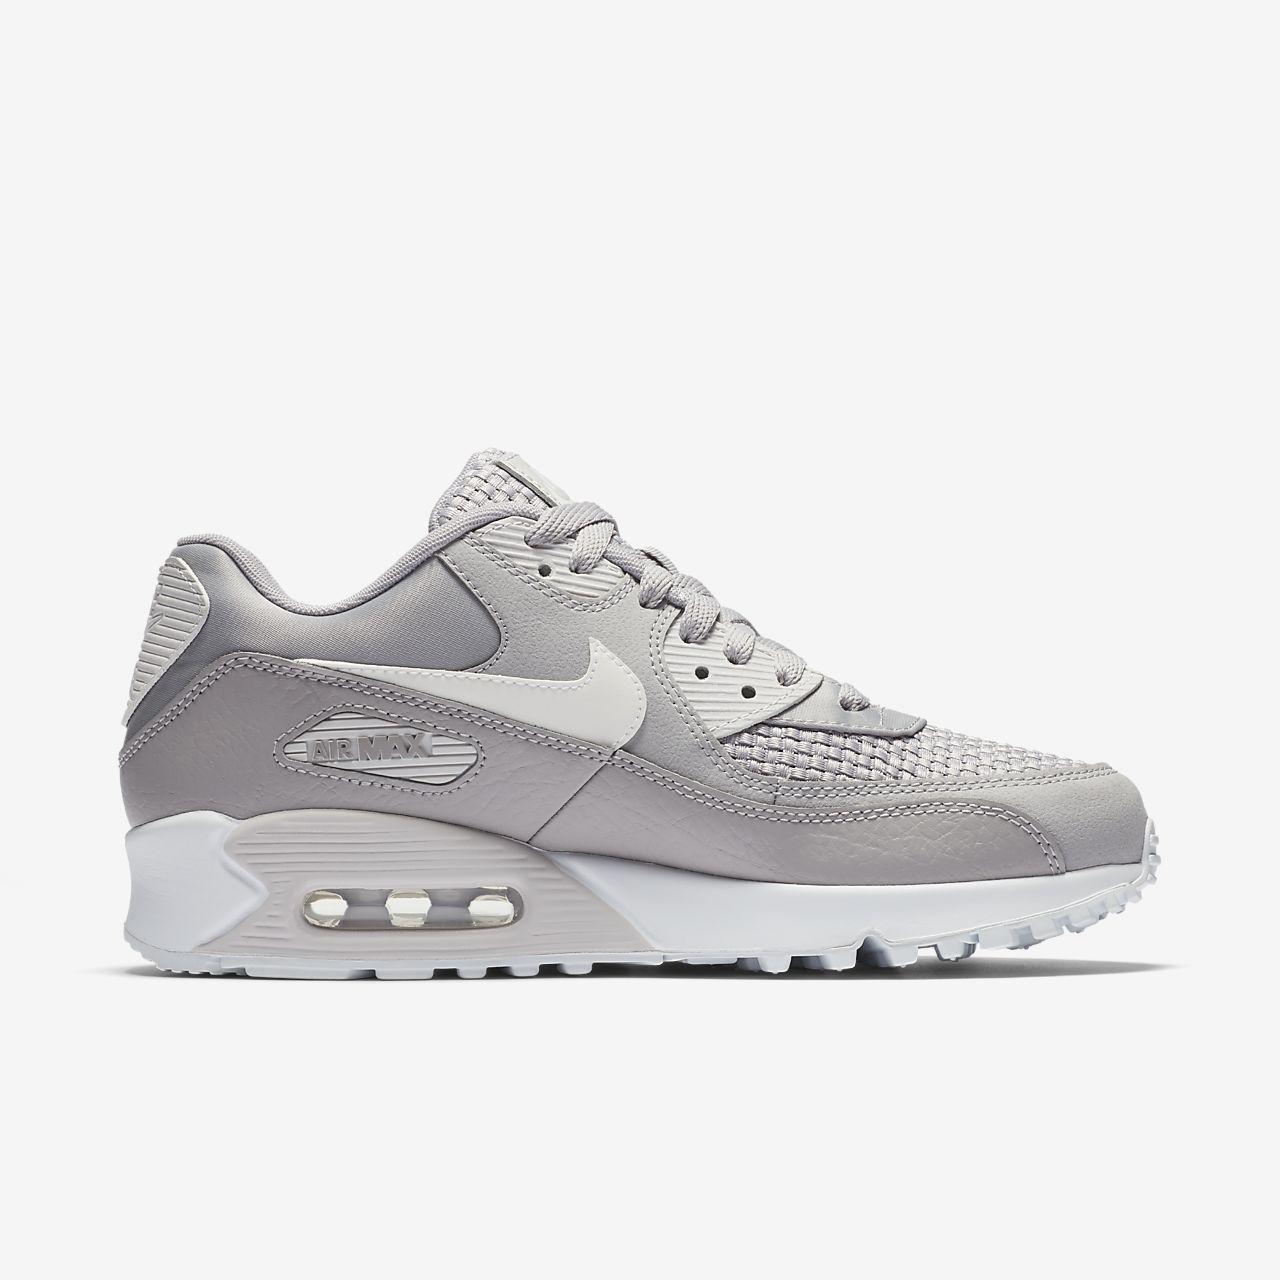 sélection premium 528ec 85eb3 Chaussure Nike Air Max 90 pour Femme. Nike LU